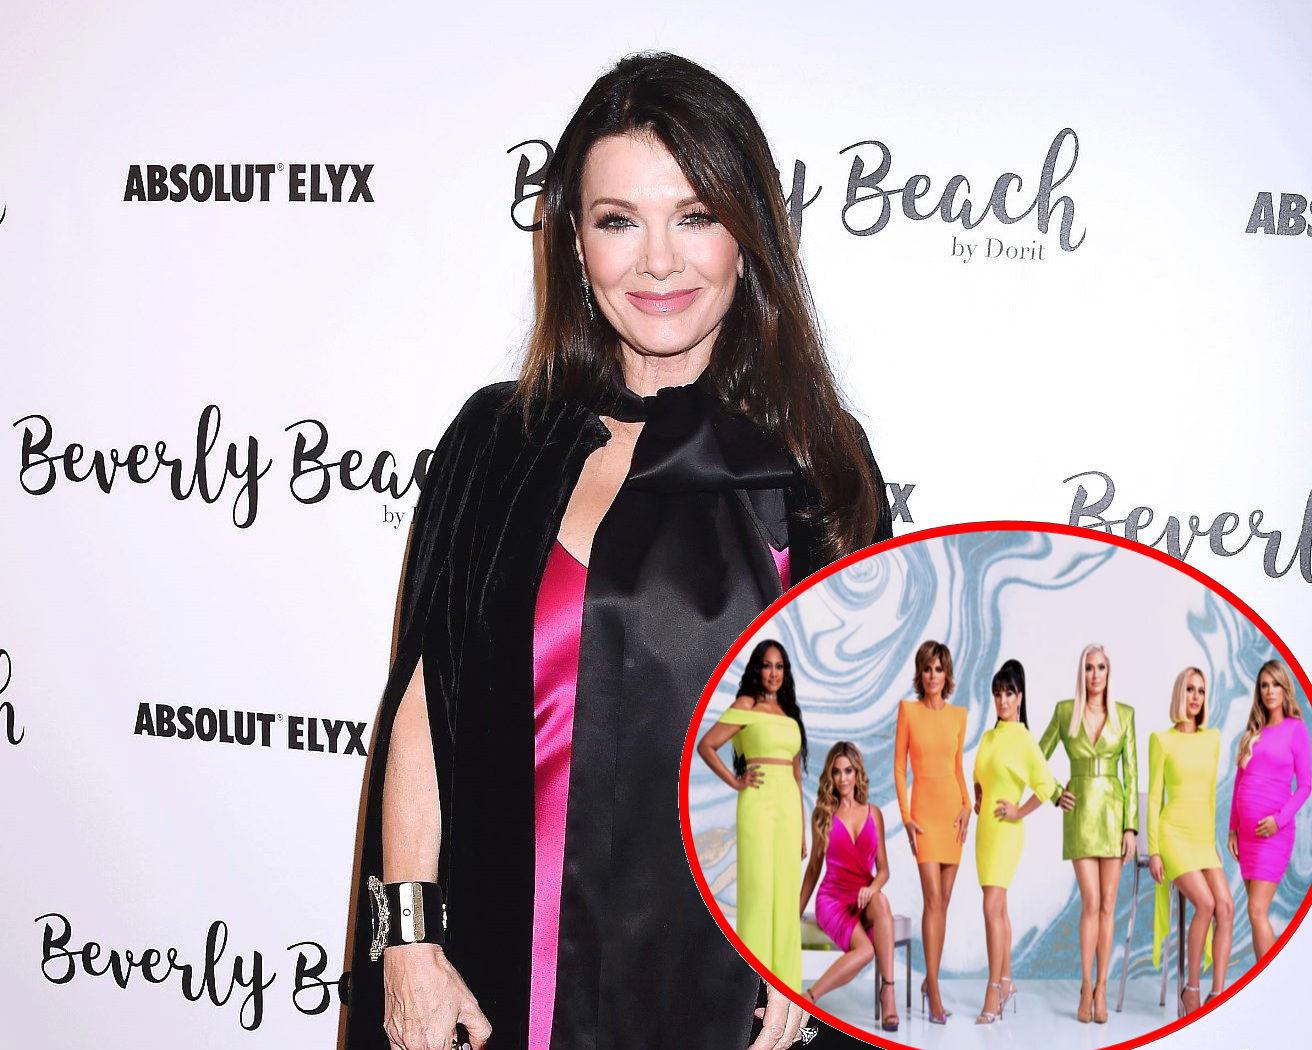 Did Bravo Shade Lisa Vanderpump With the Title of the RHOBH Season 10 Premiere? Plus Lisa Shares Cheeky 'Self Care' Video